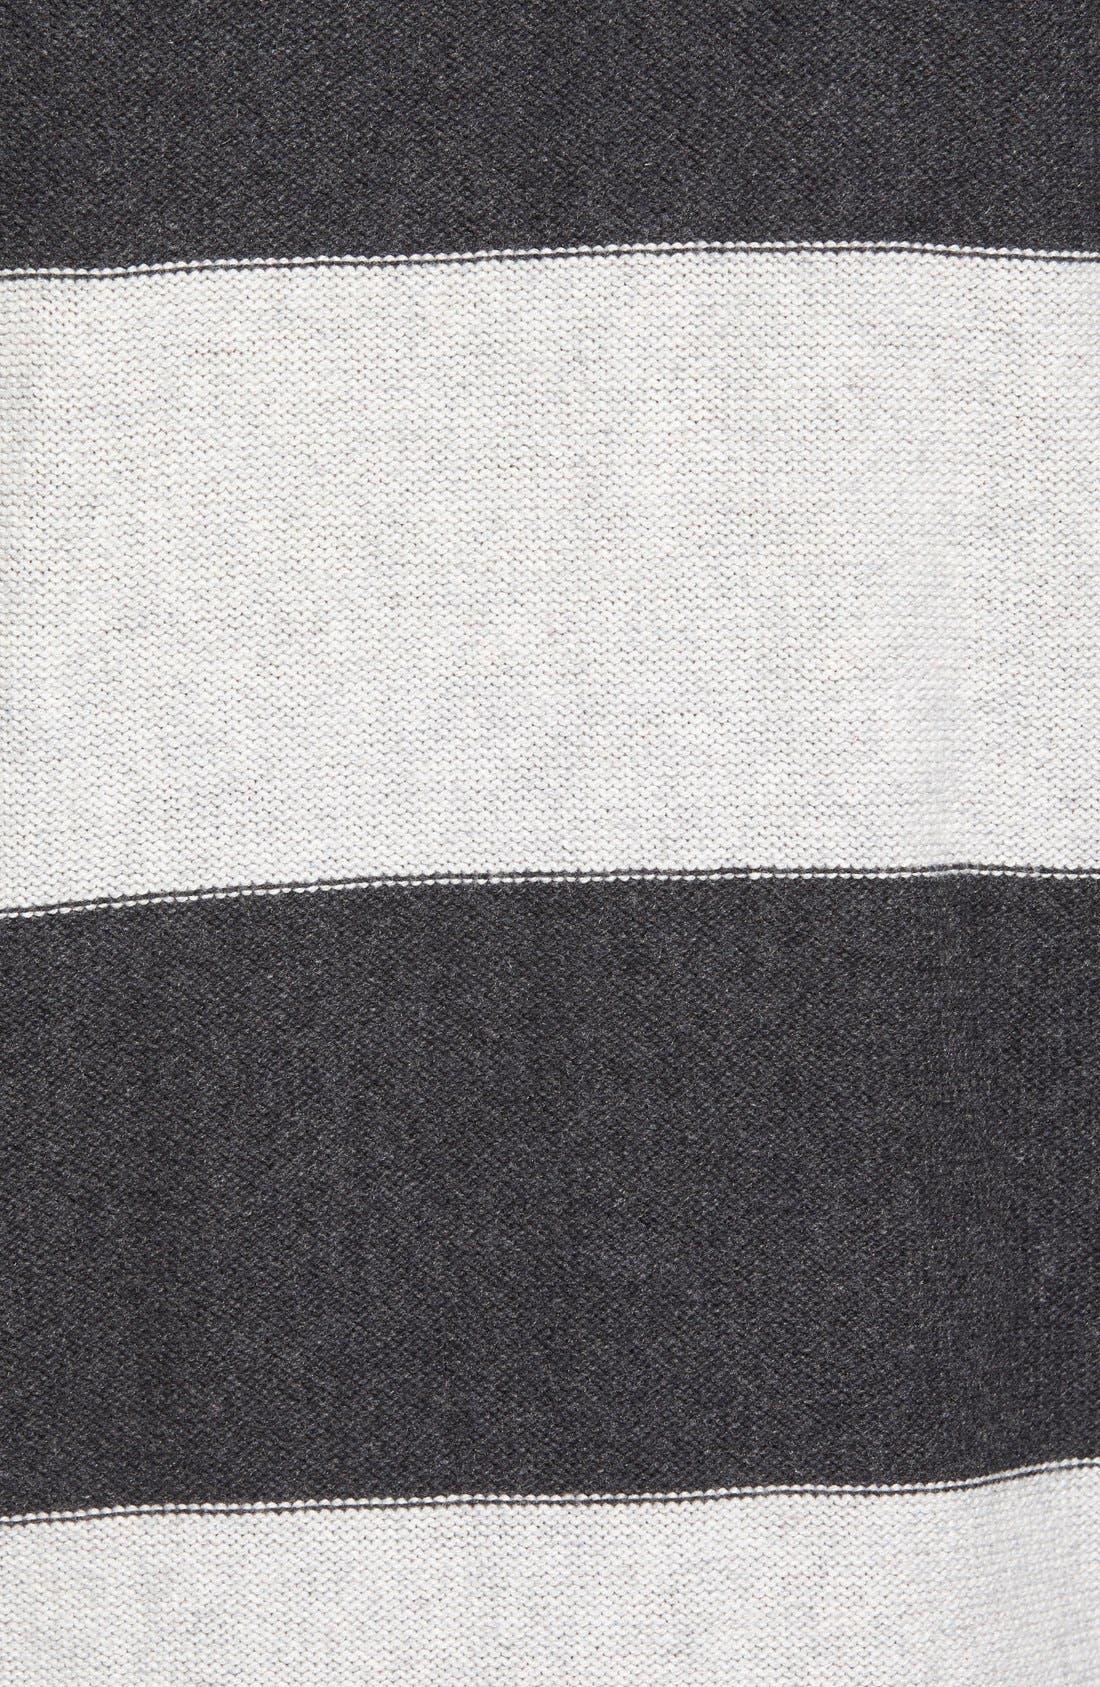 Contrast Cuff Crewneck Sweater,                             Alternate thumbnail 60, color,